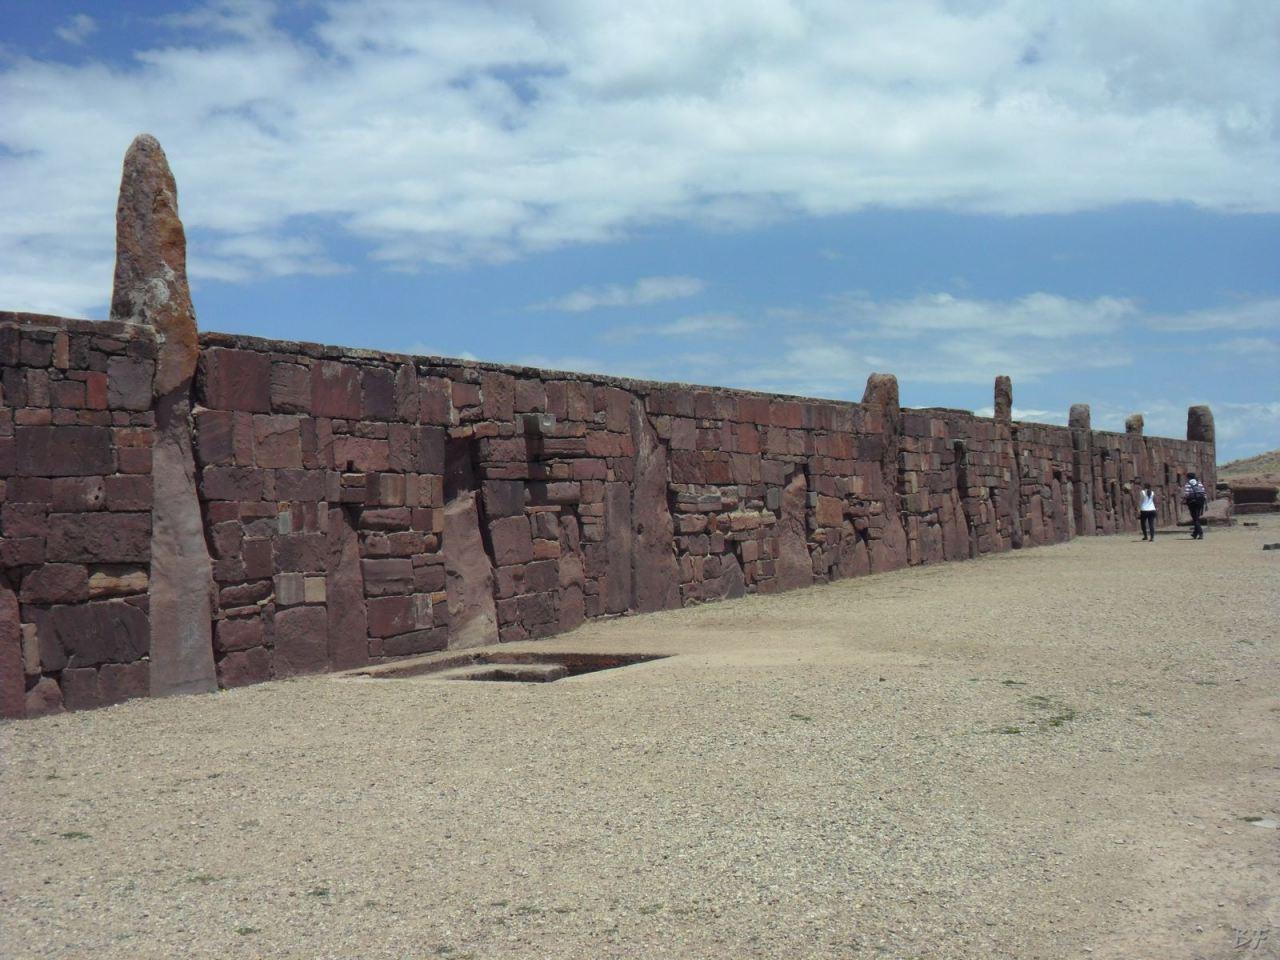 Sito-Megalitico-Piramide-Akapana-Kalasasaya-Menhir-Tiahuanaco-Bolivia-18